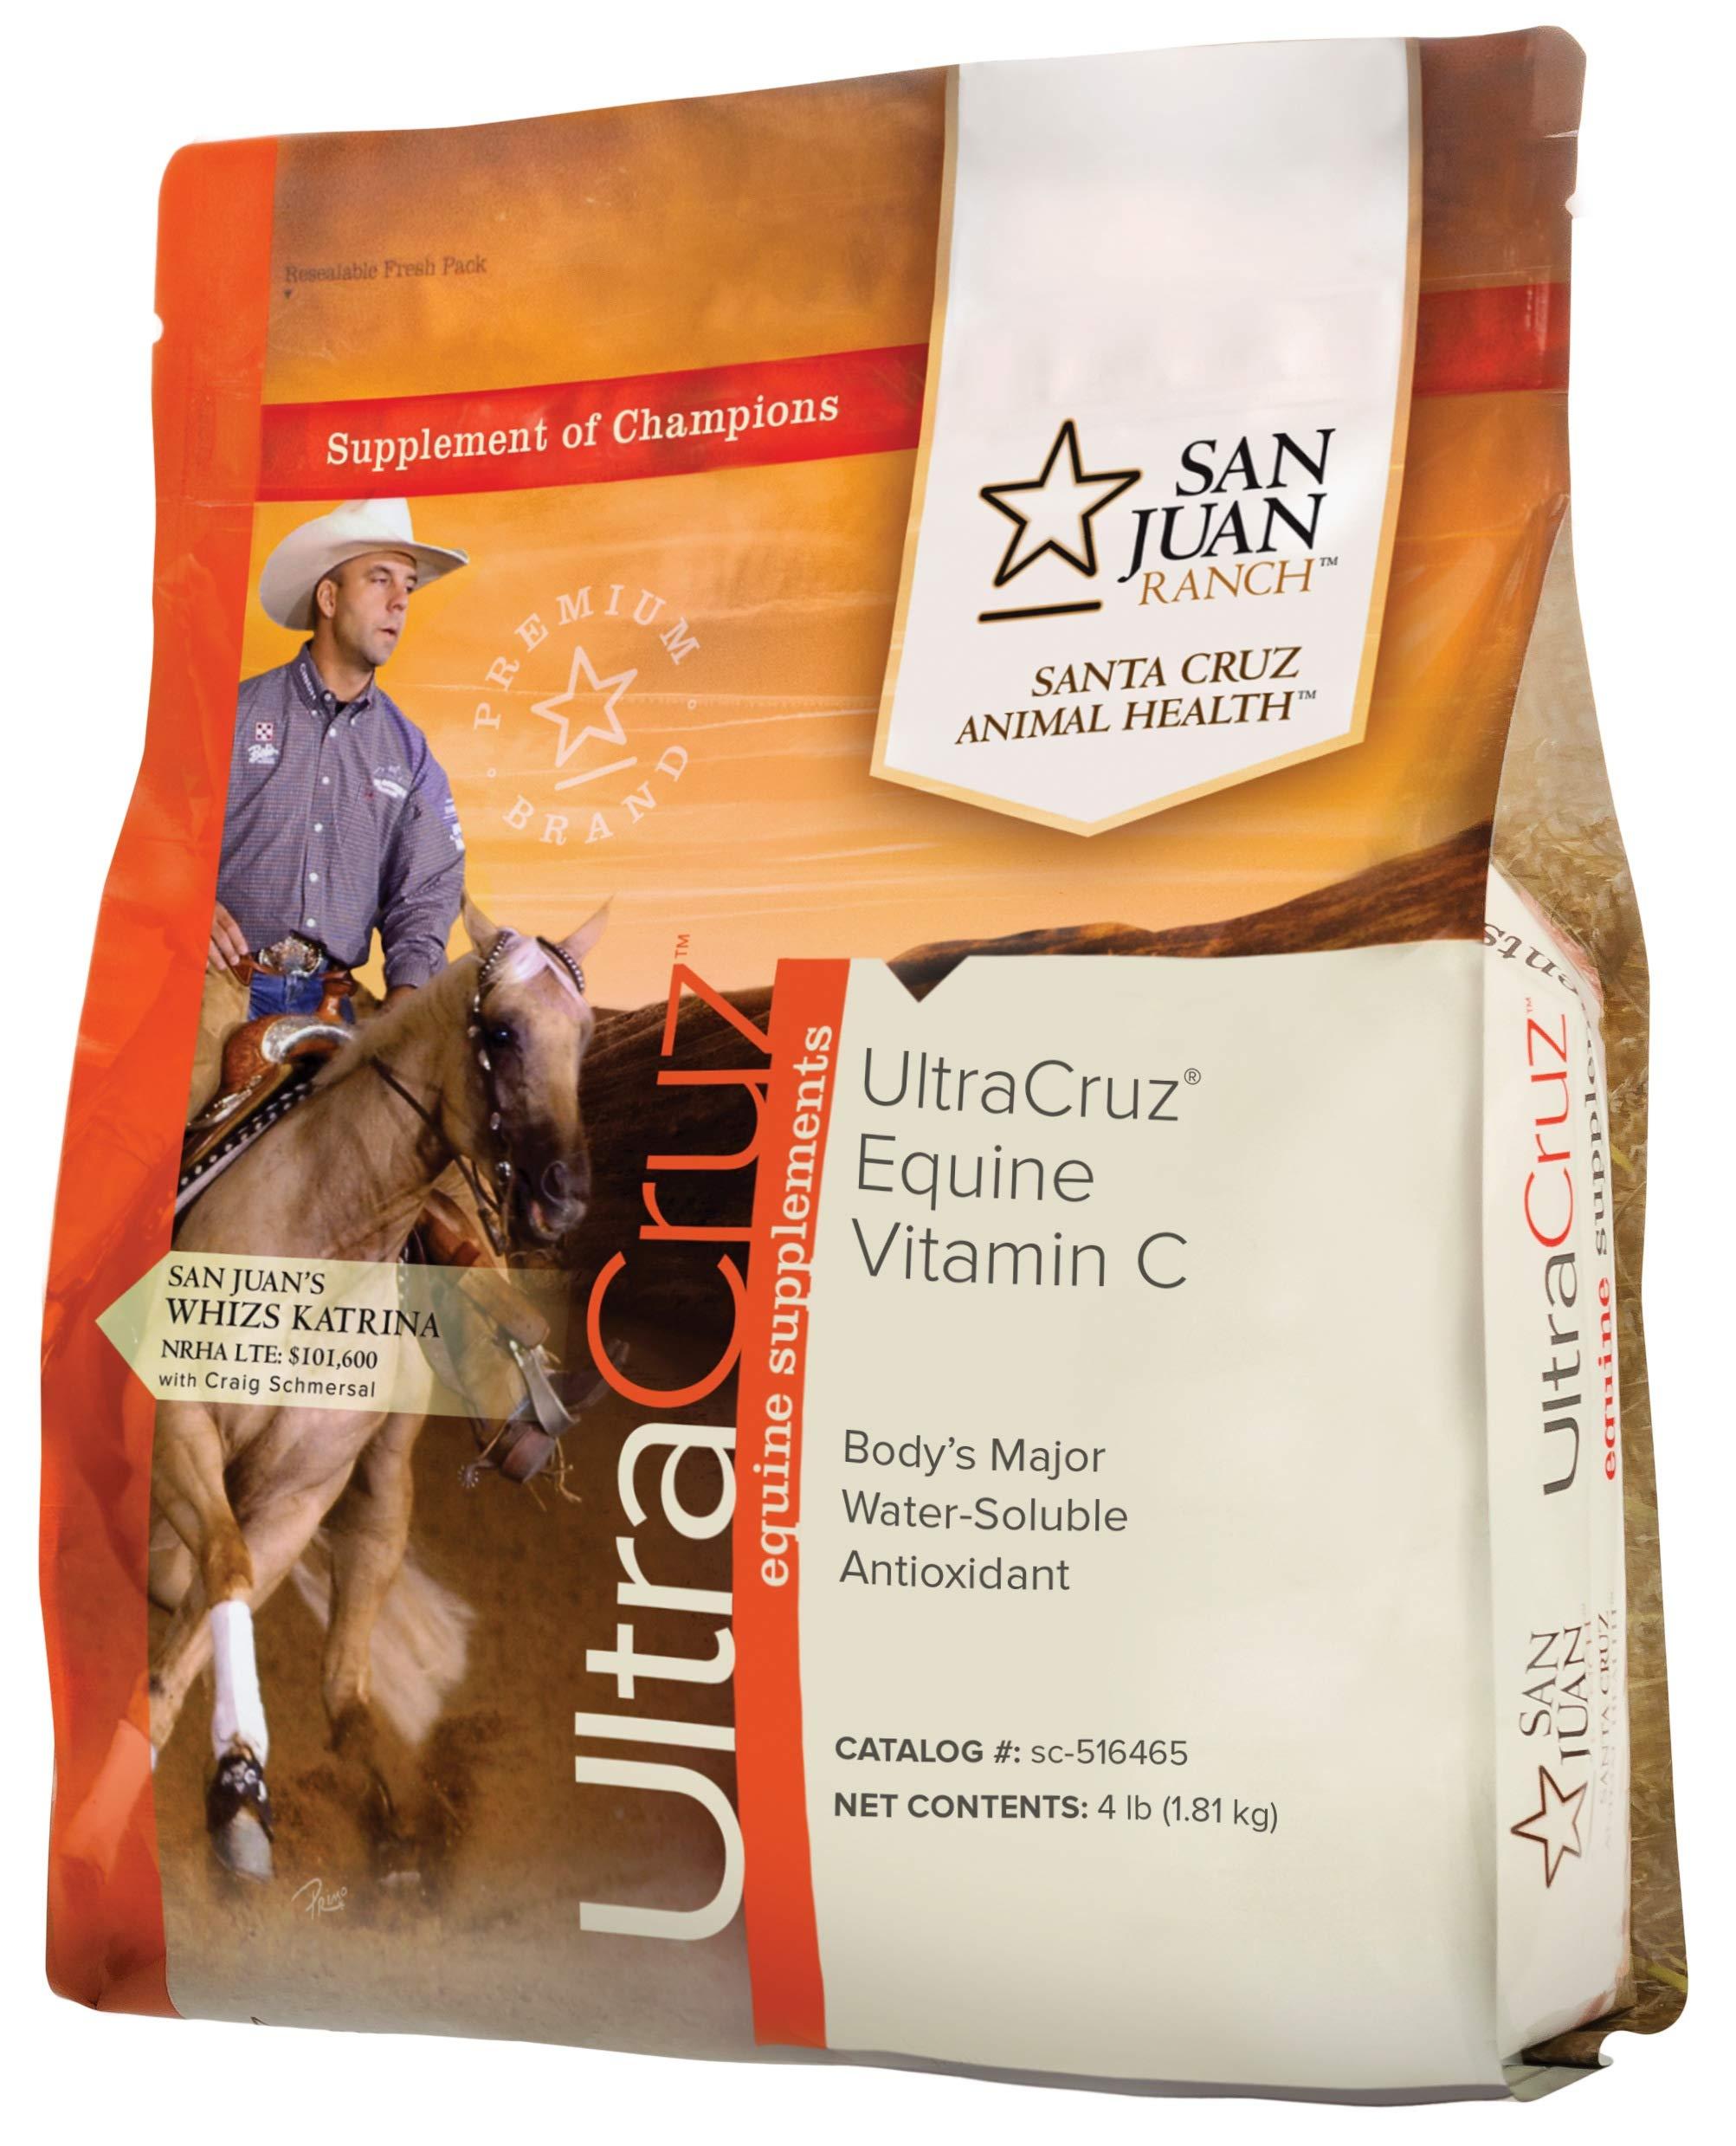 UltraCruz Equine Vitamin C (Ascorbic Acid) Supplement for Horses, 1 lb, Powder (50 Day Supply) by UltraCruz